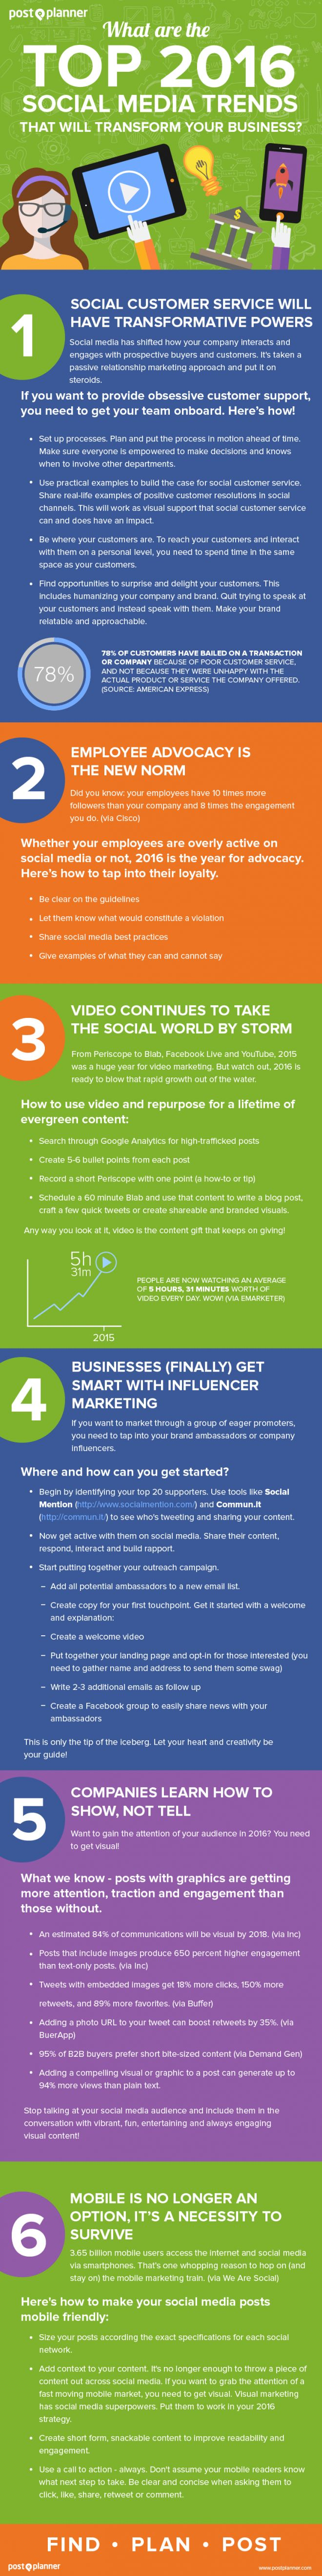 6 Social Media Trends That Will Transform Your Business http://rebekahradice.com/social-media-trends-that-will-transform-your-business/